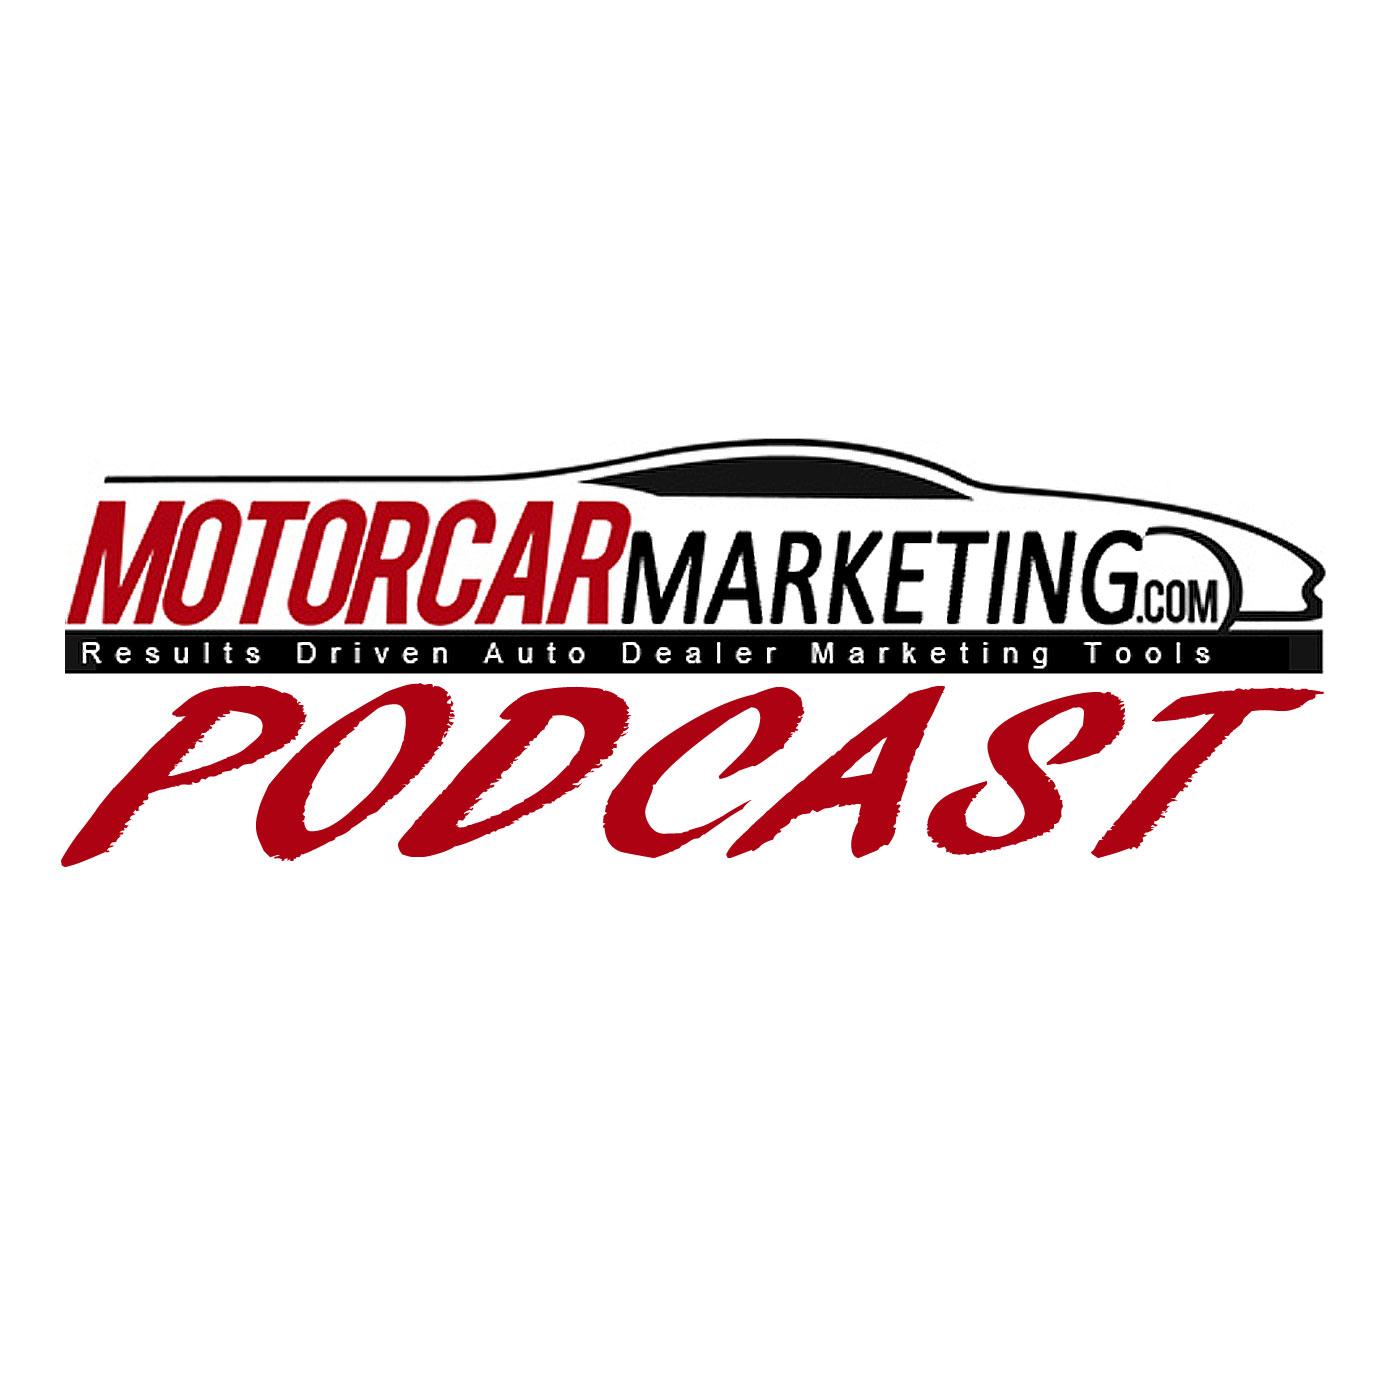 The Motorcar Marketing Podcast | Listen via Stitcher Radio On Demand